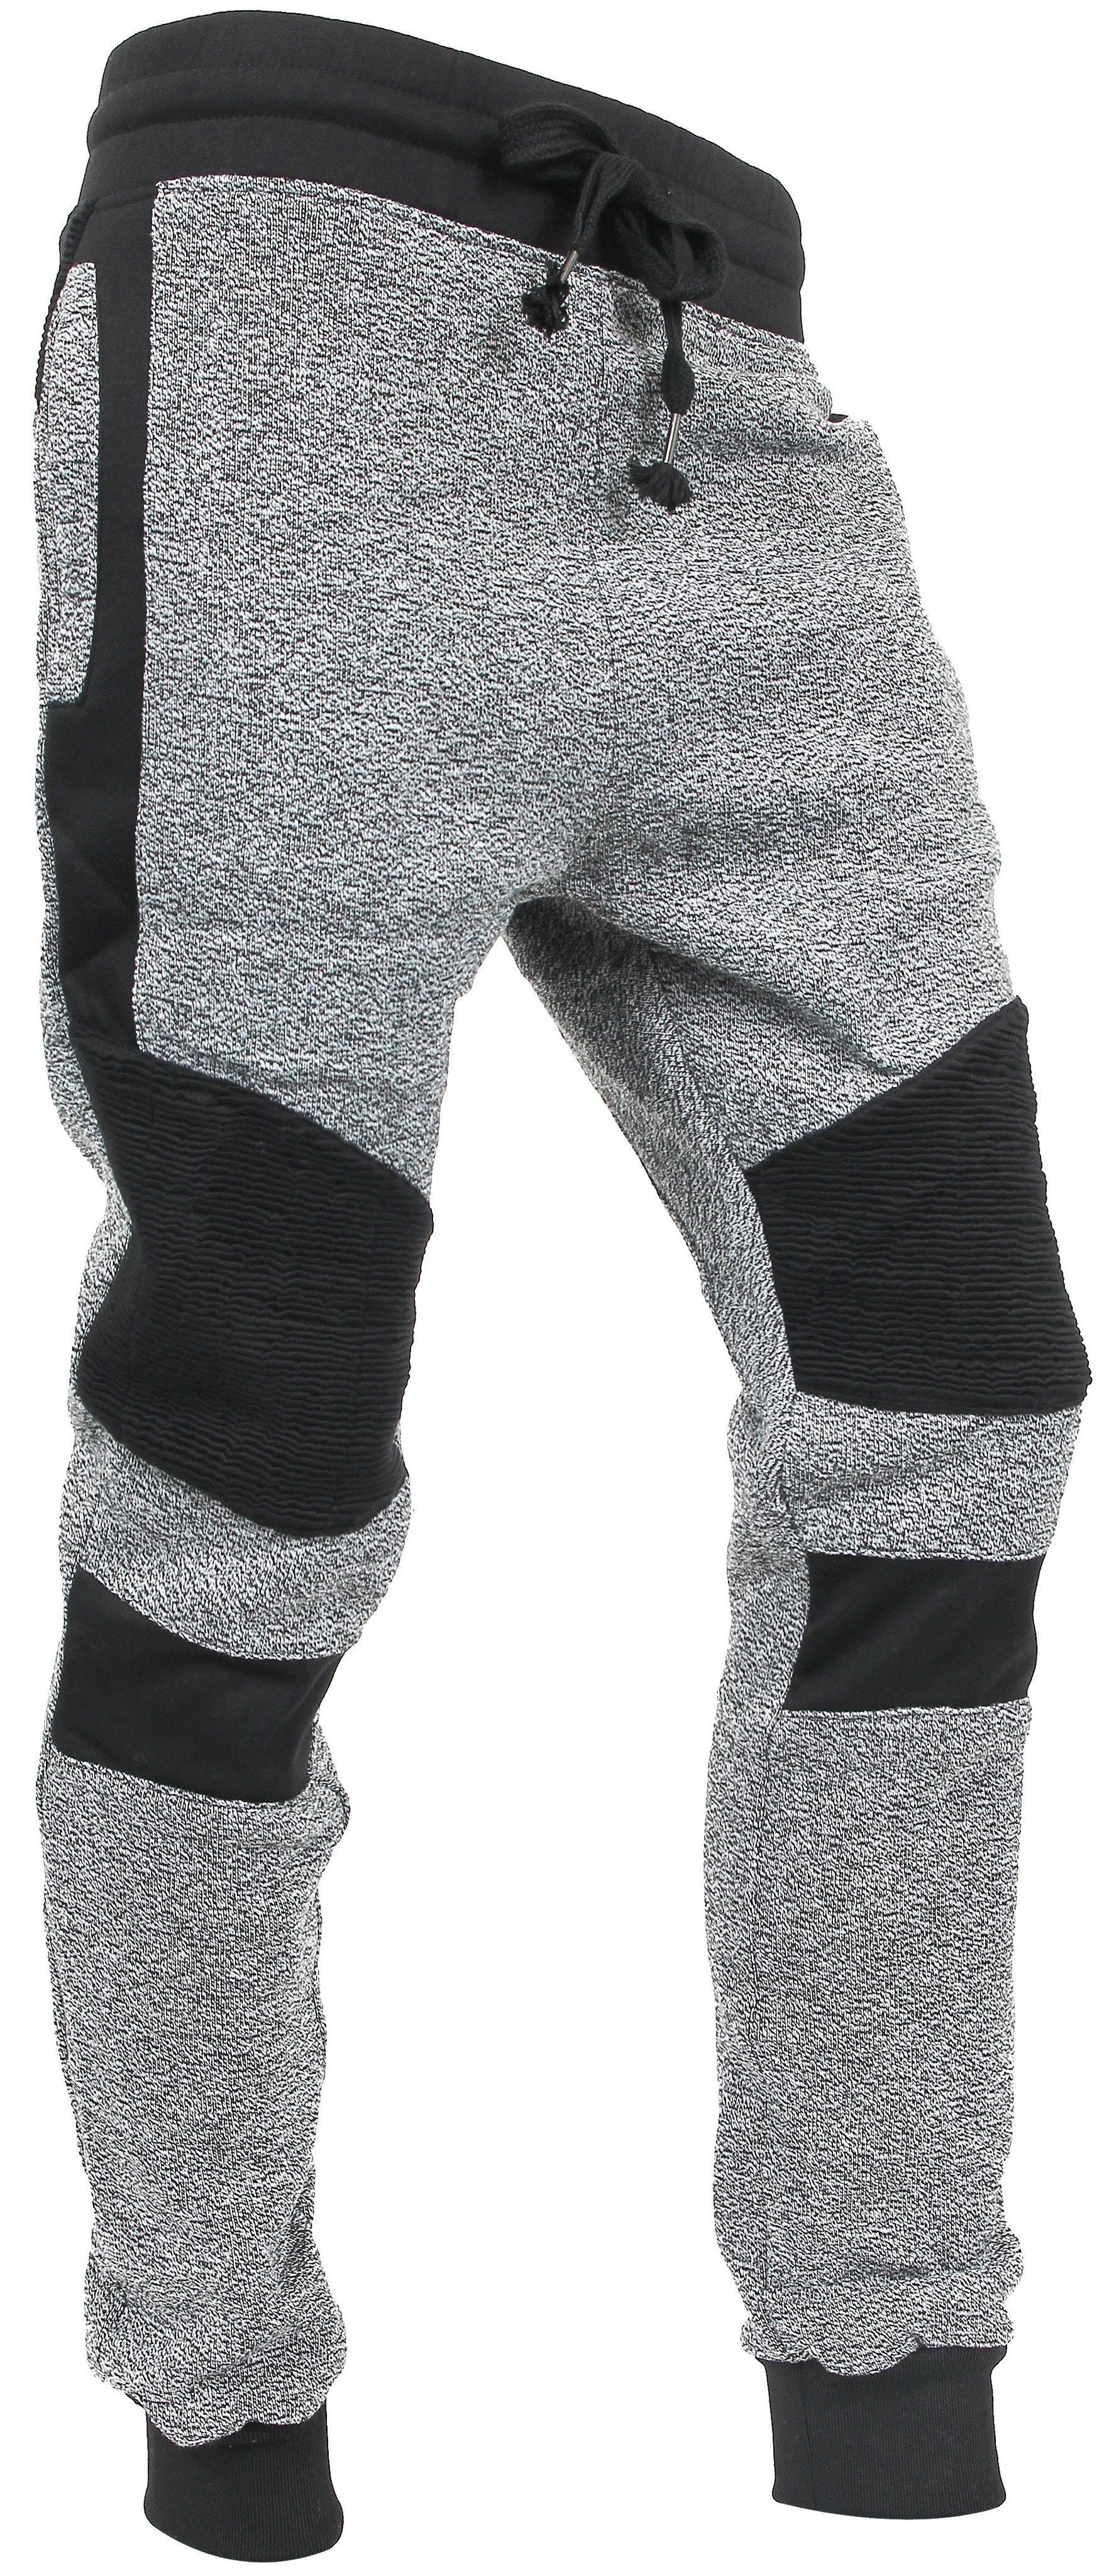 ba3f0cca0 Mens Fleece Jogger Pants Abrigos Hombre, Hombres, Pantalones De Chándal  Para Hombre, Estilos